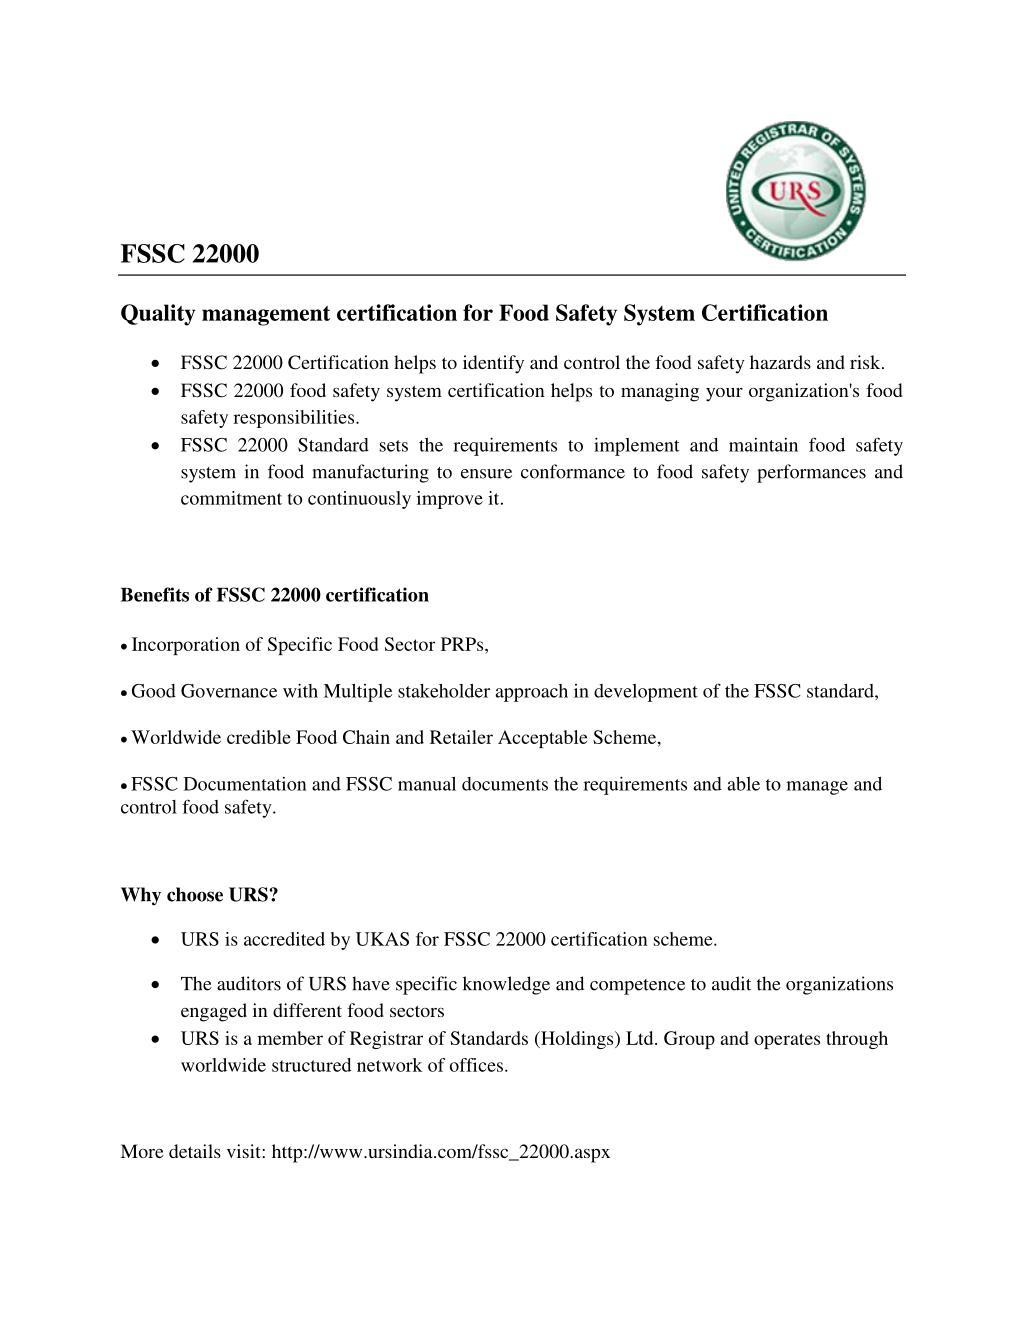 PPT - fssc 22000 certification PowerPoint Presentation - ID:7181406